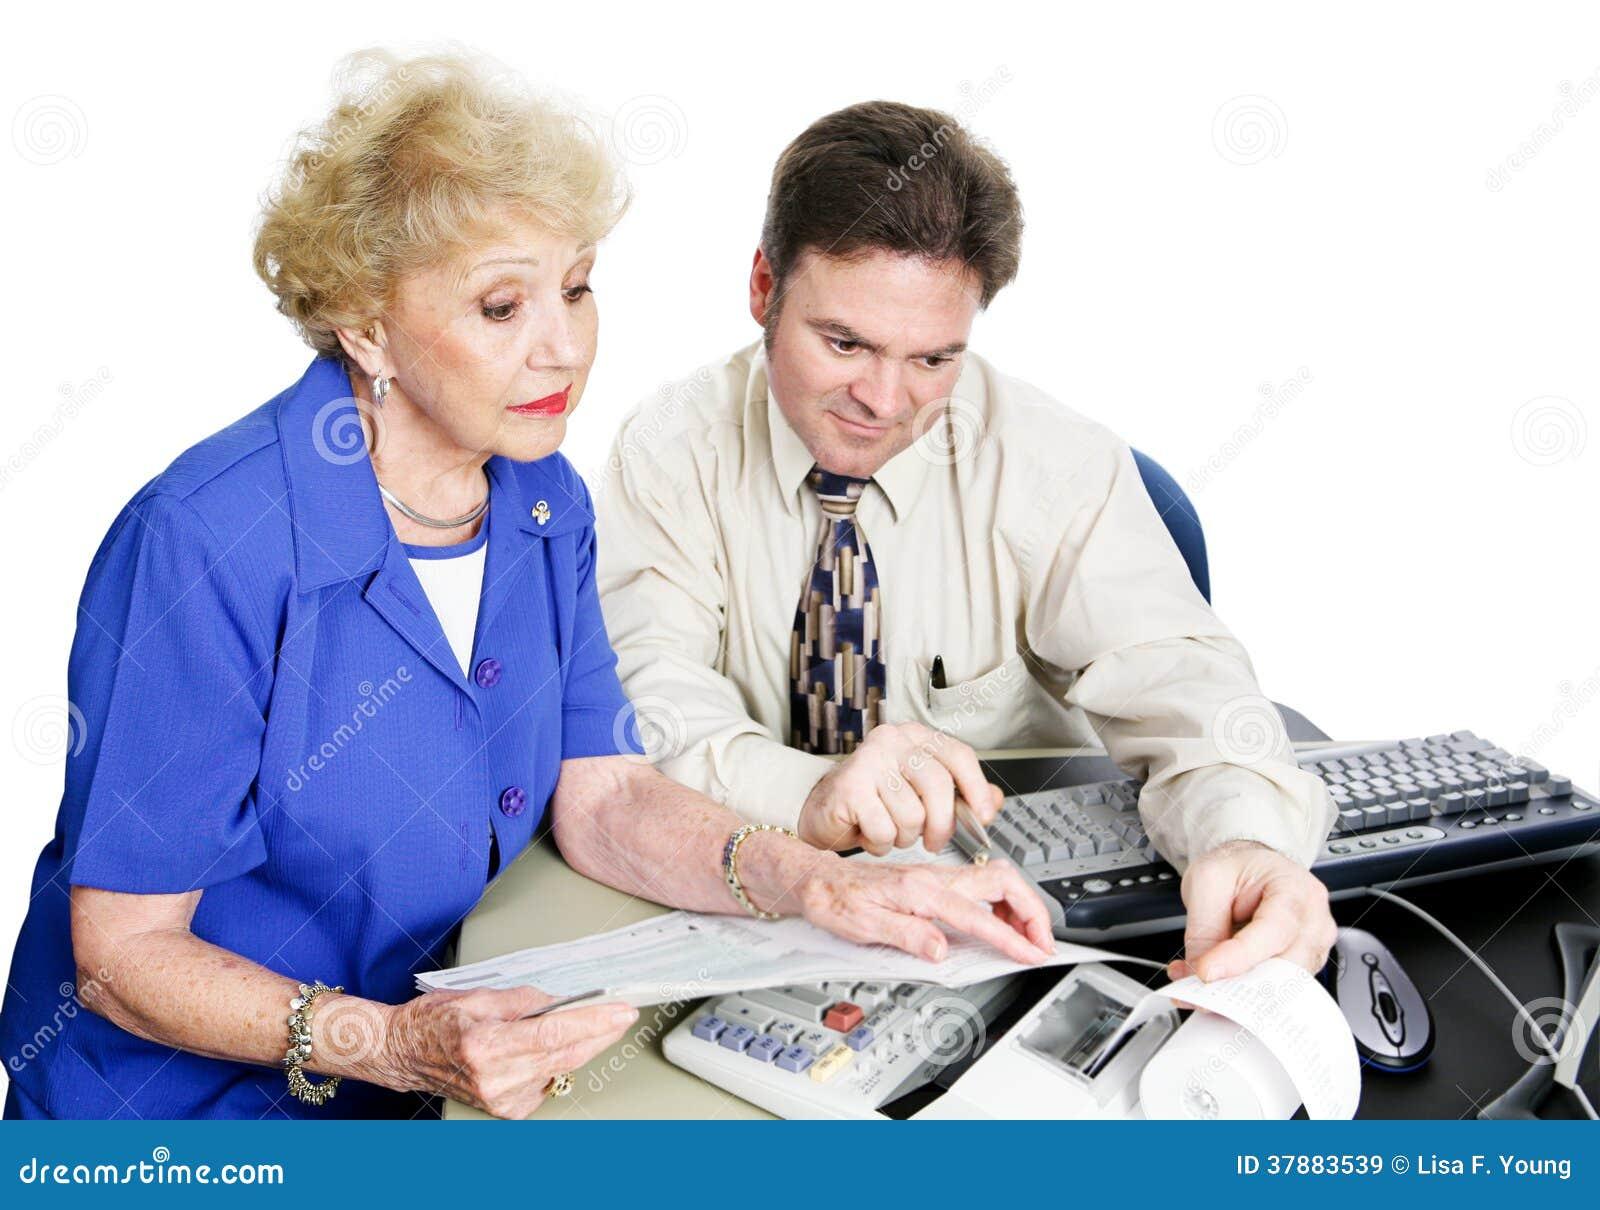 Hogere Woiman raadpleegt Accountant